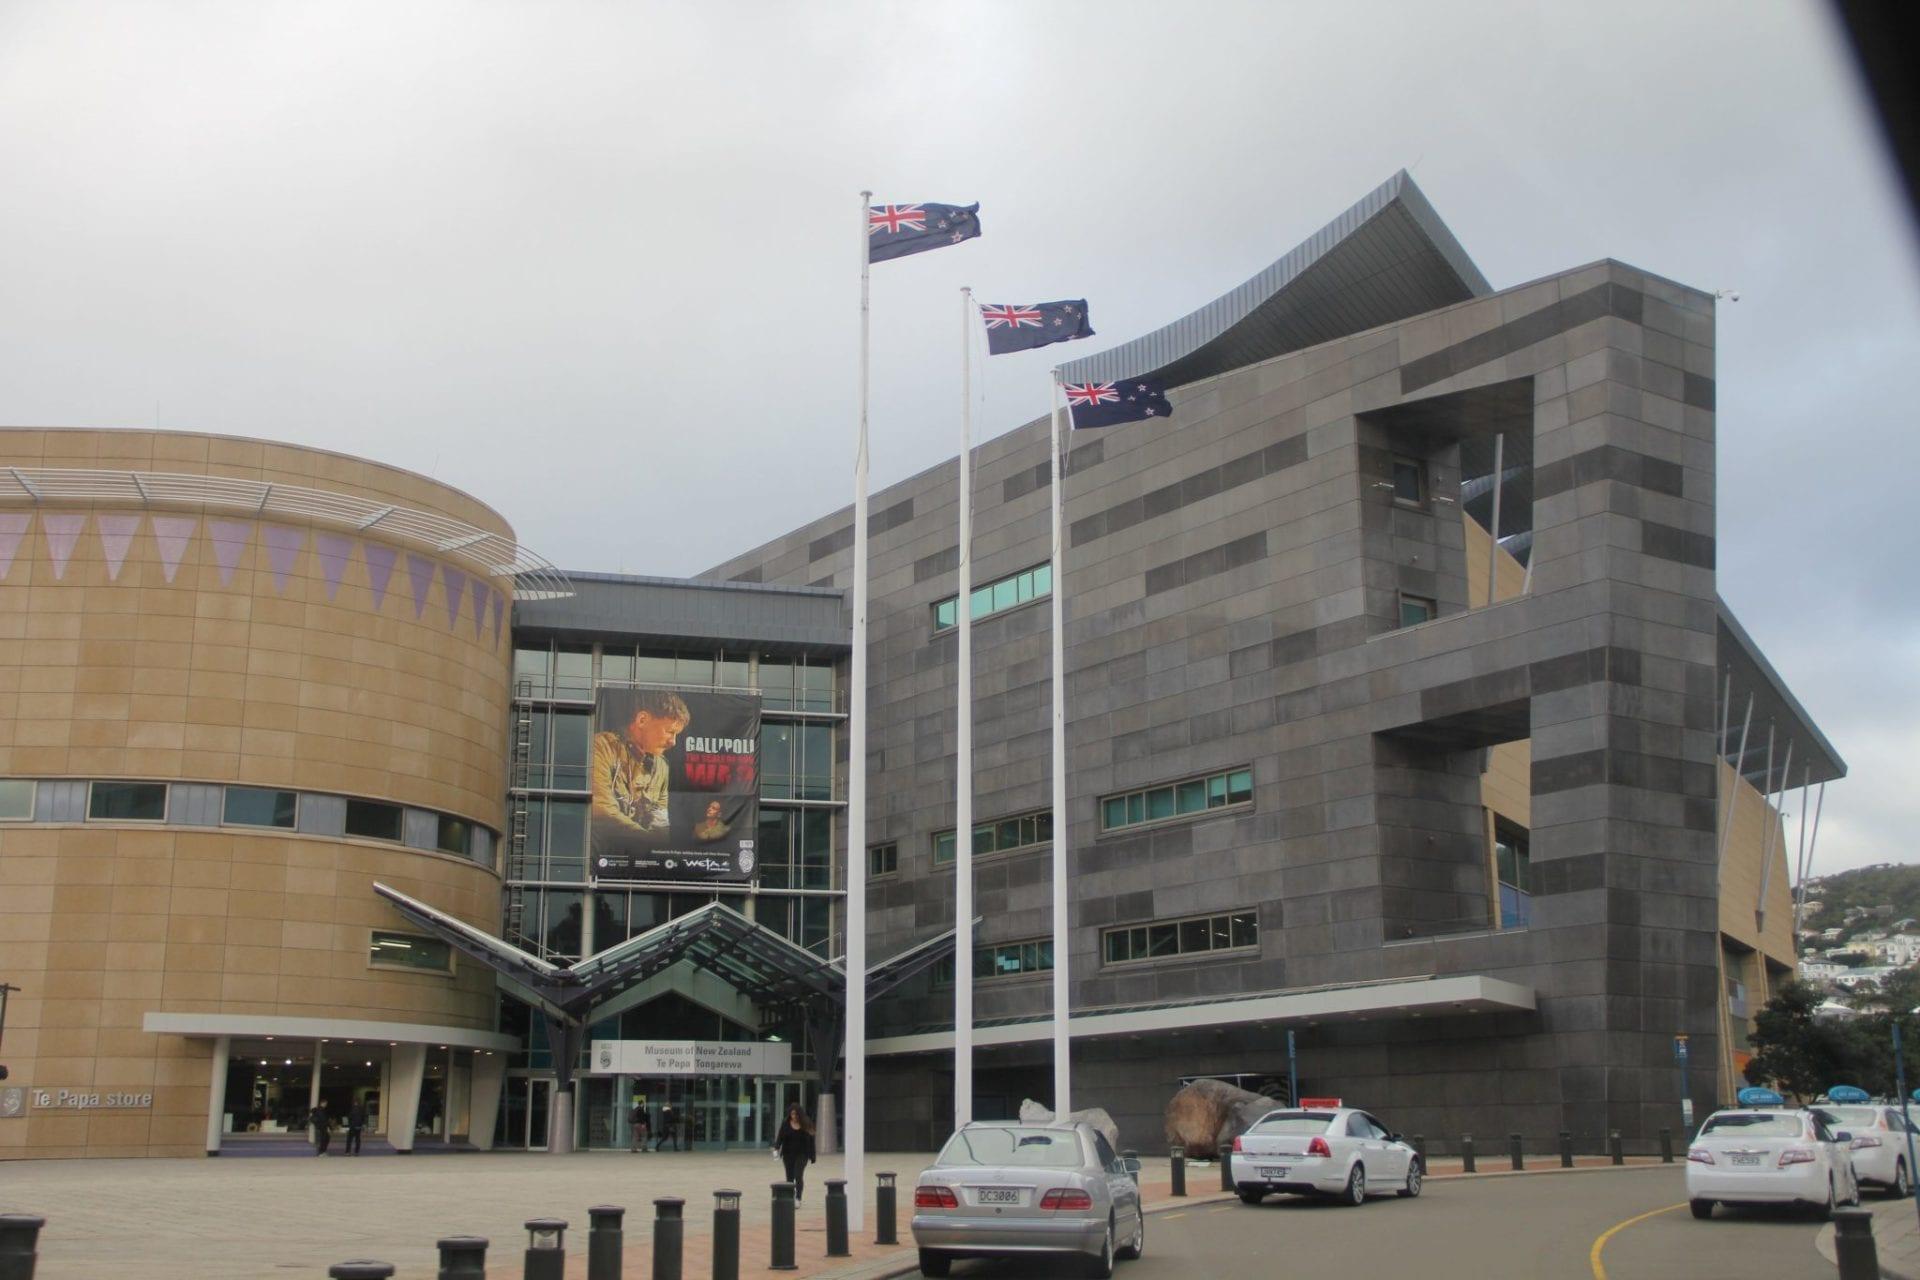 Wellington Museum of New Zealand